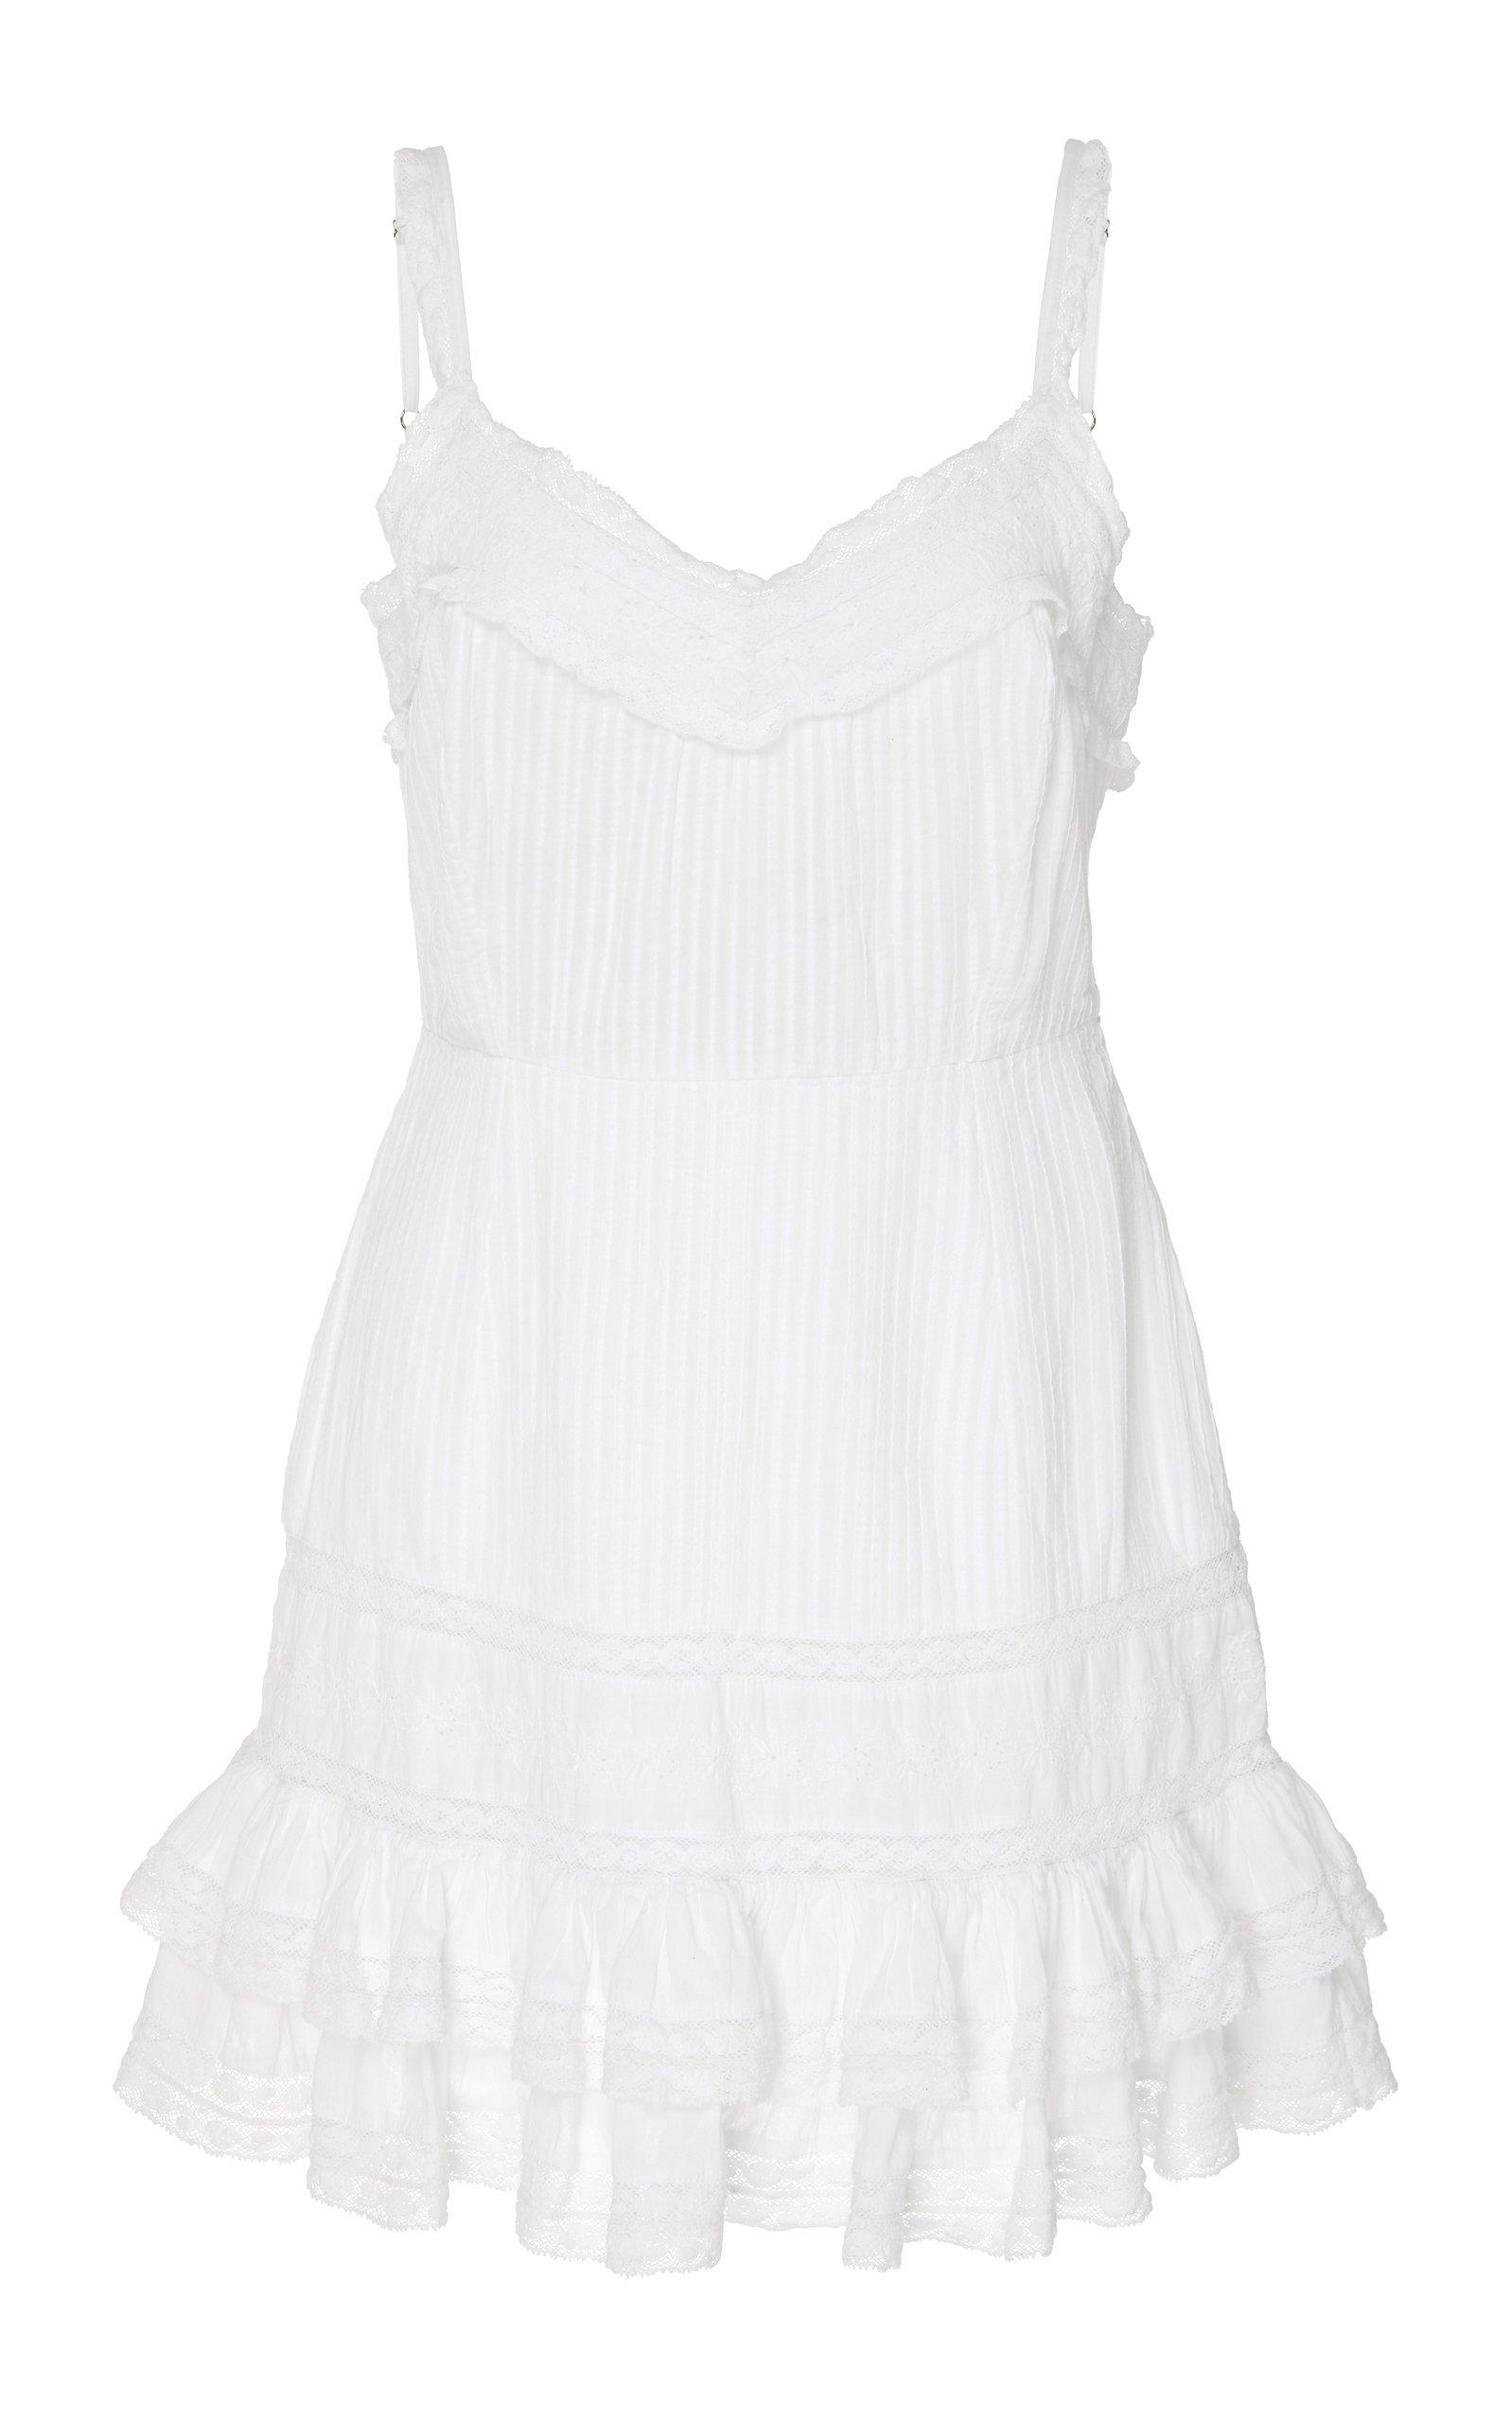 Tallulah Ruffled Lace-Trimmed Cotton Mini Dress by LoveShackFancy | Moda Operandi